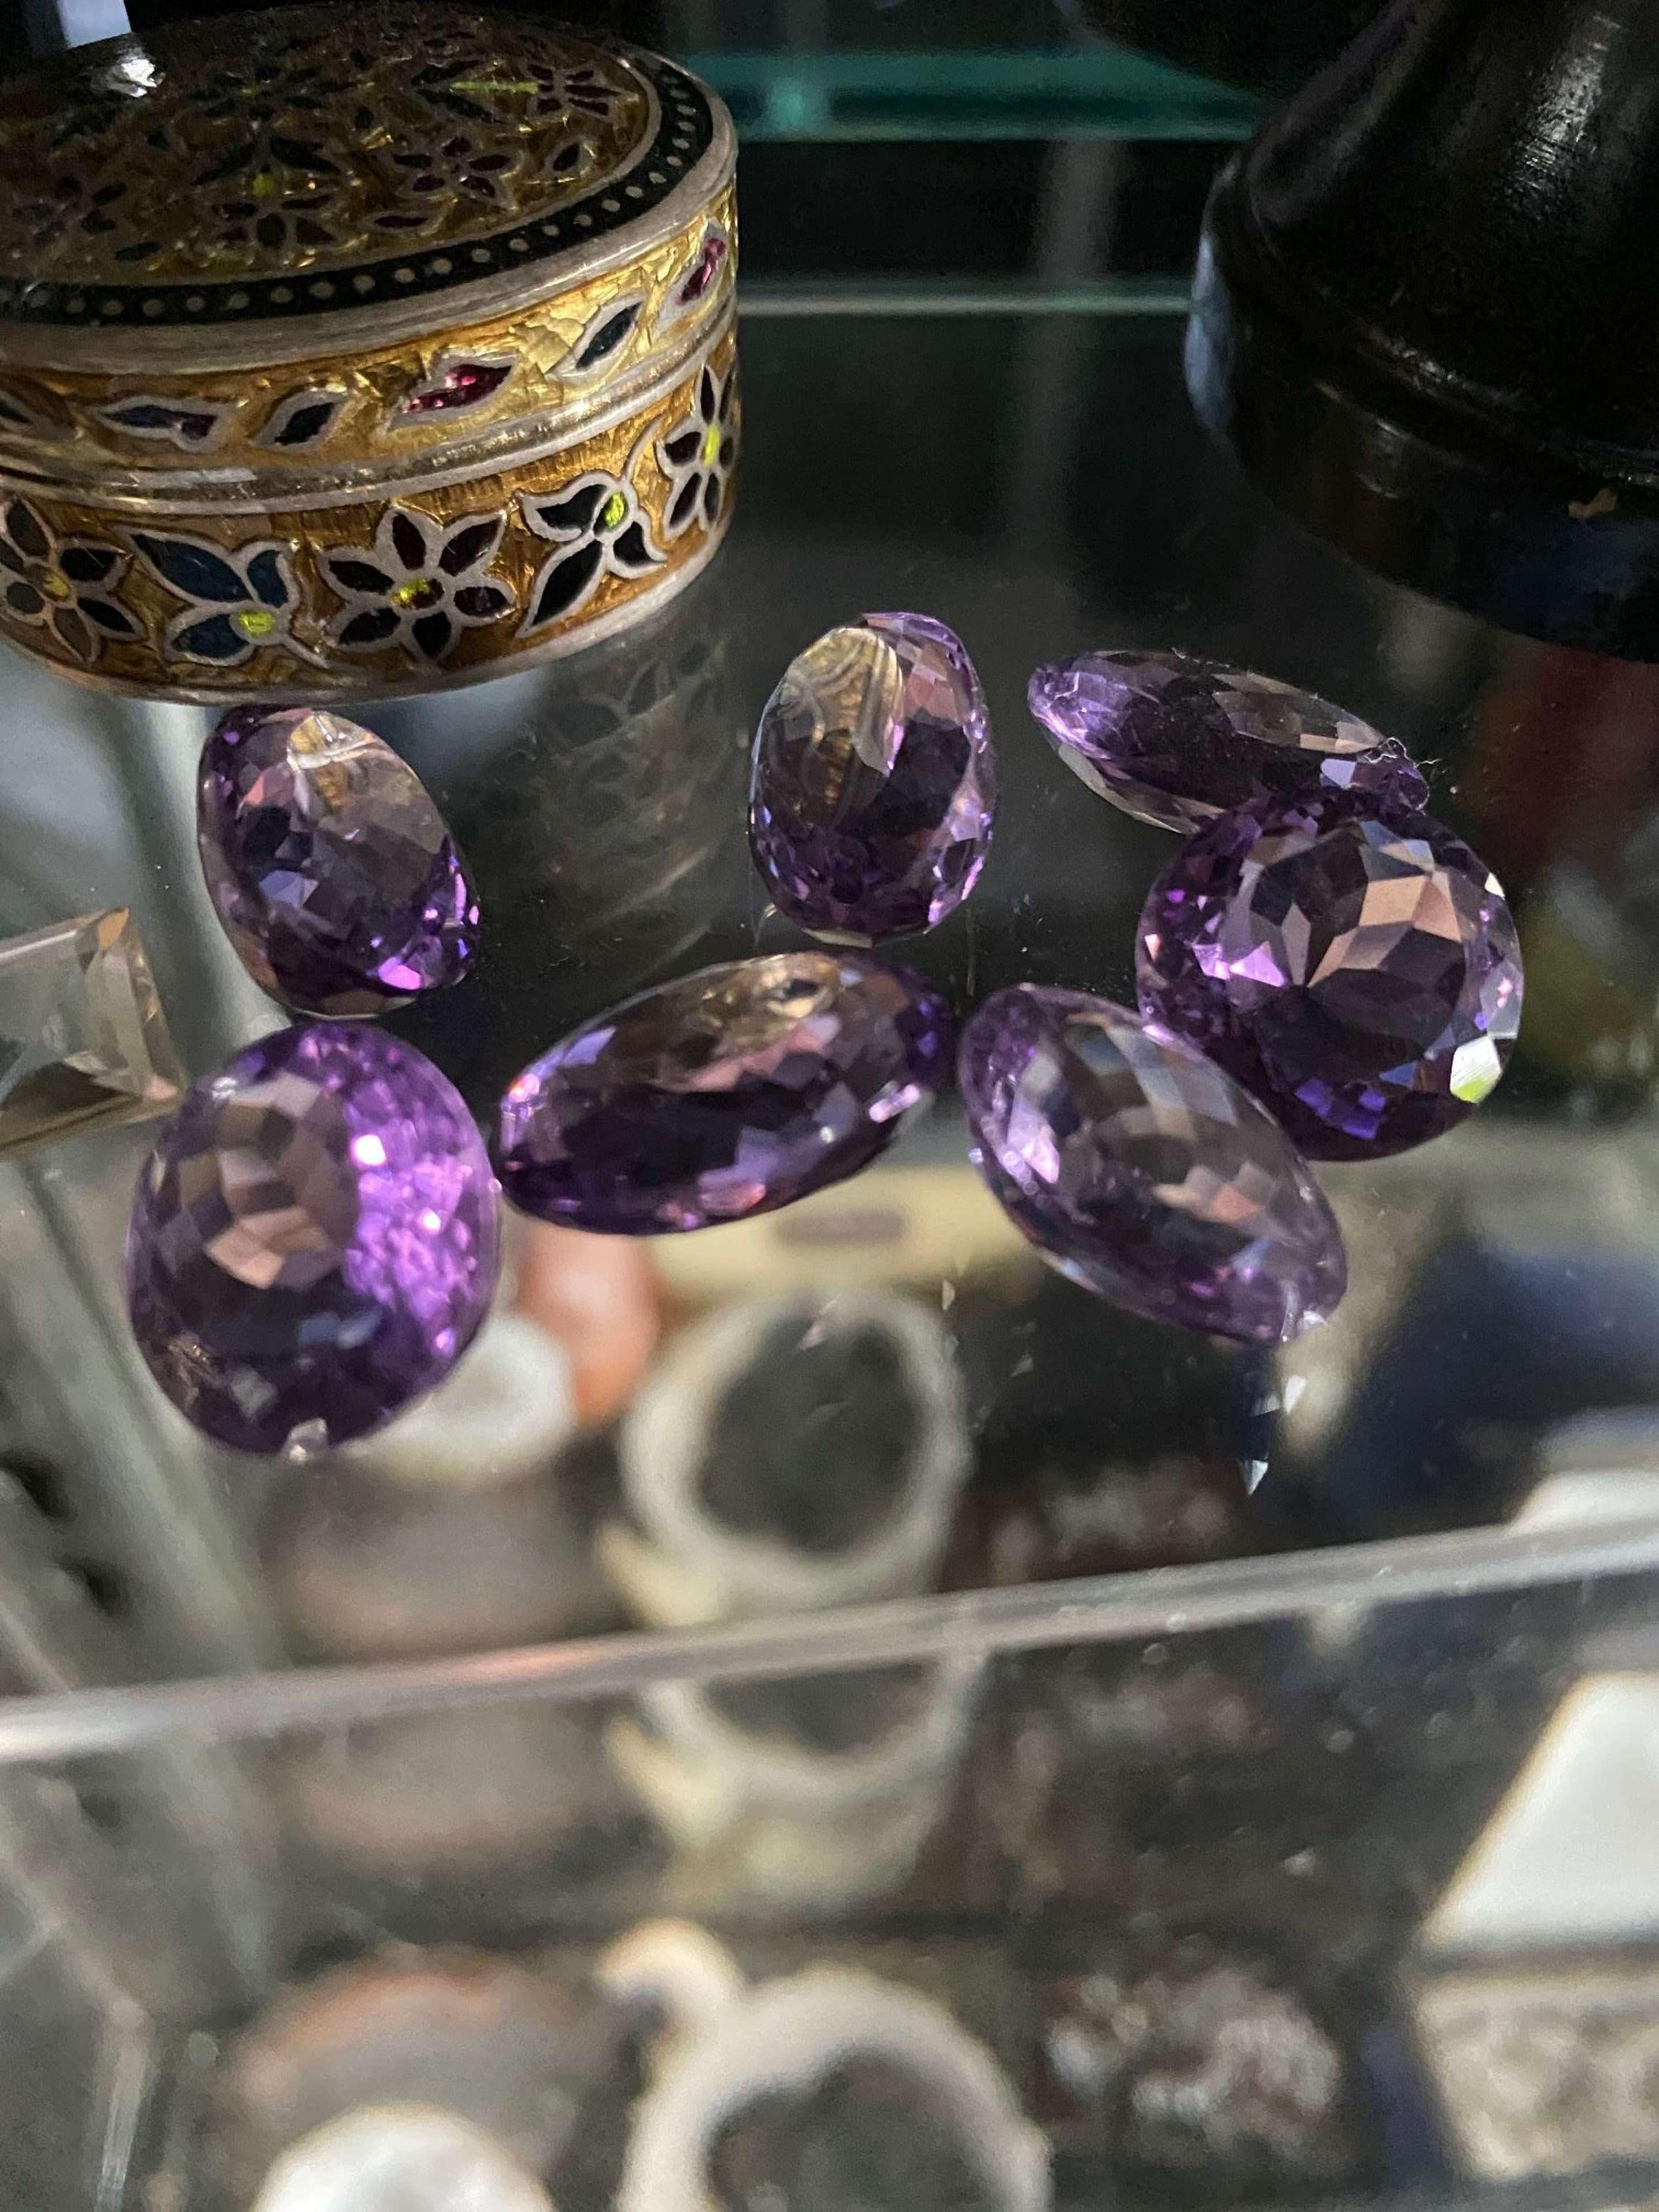 Old amethyst stones